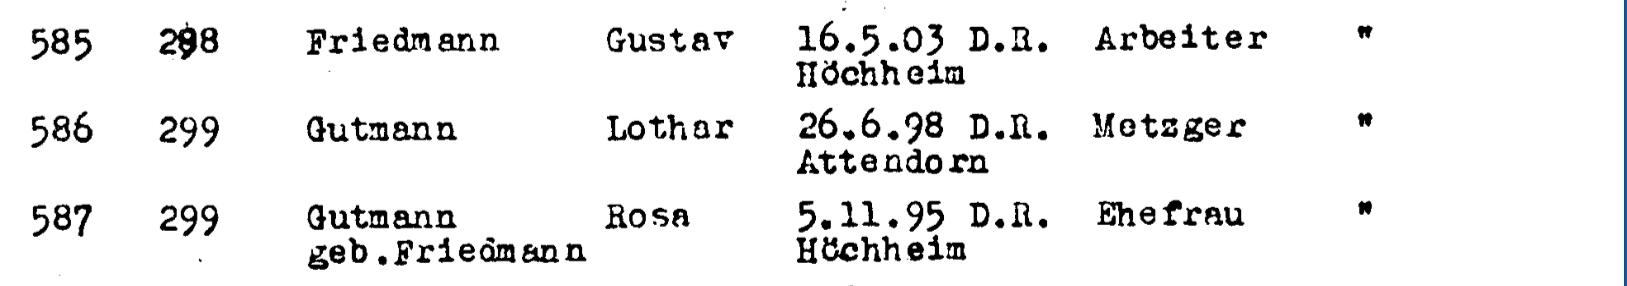 Lothar Guthmann-25.04.1942